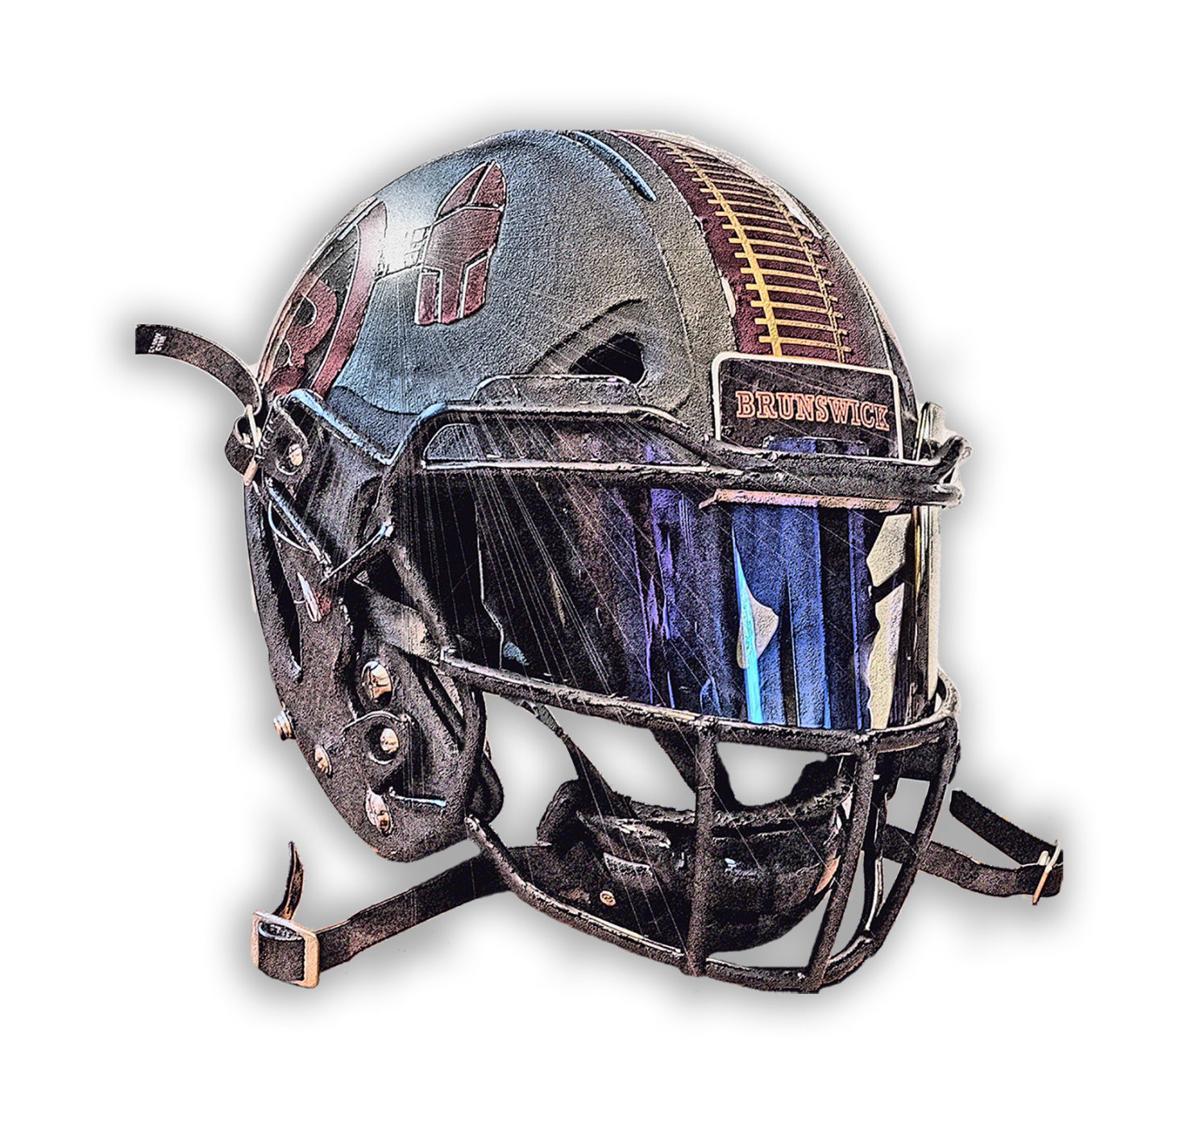 Railroaders semipro helmet